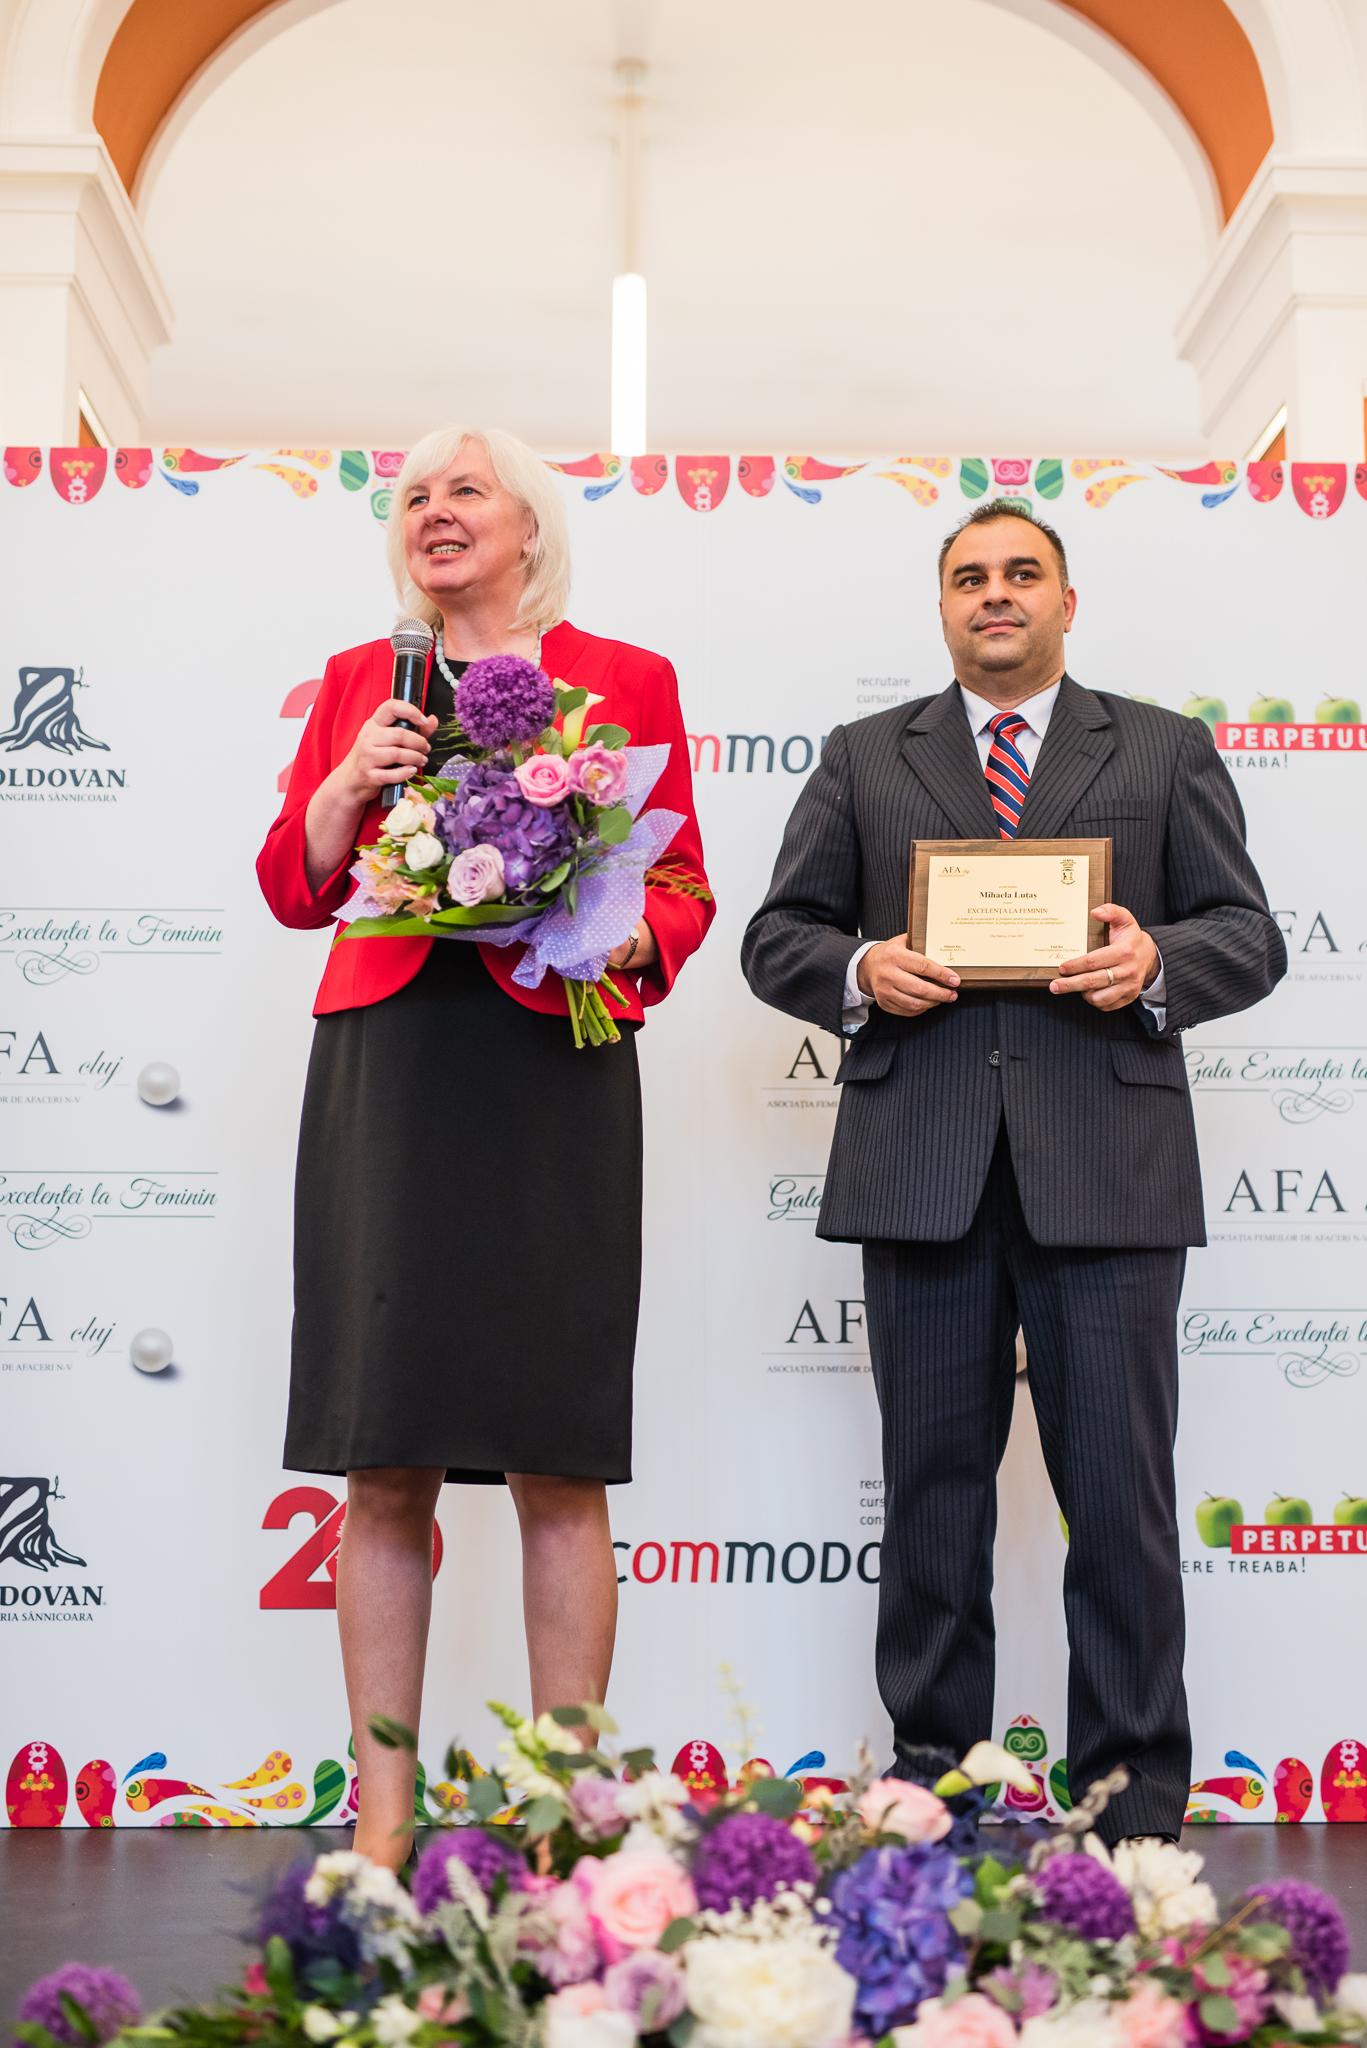 Gala-Excelentei-la-Feminin-2018-Mihaela-Lutas-si-Dan-Tarcea-1